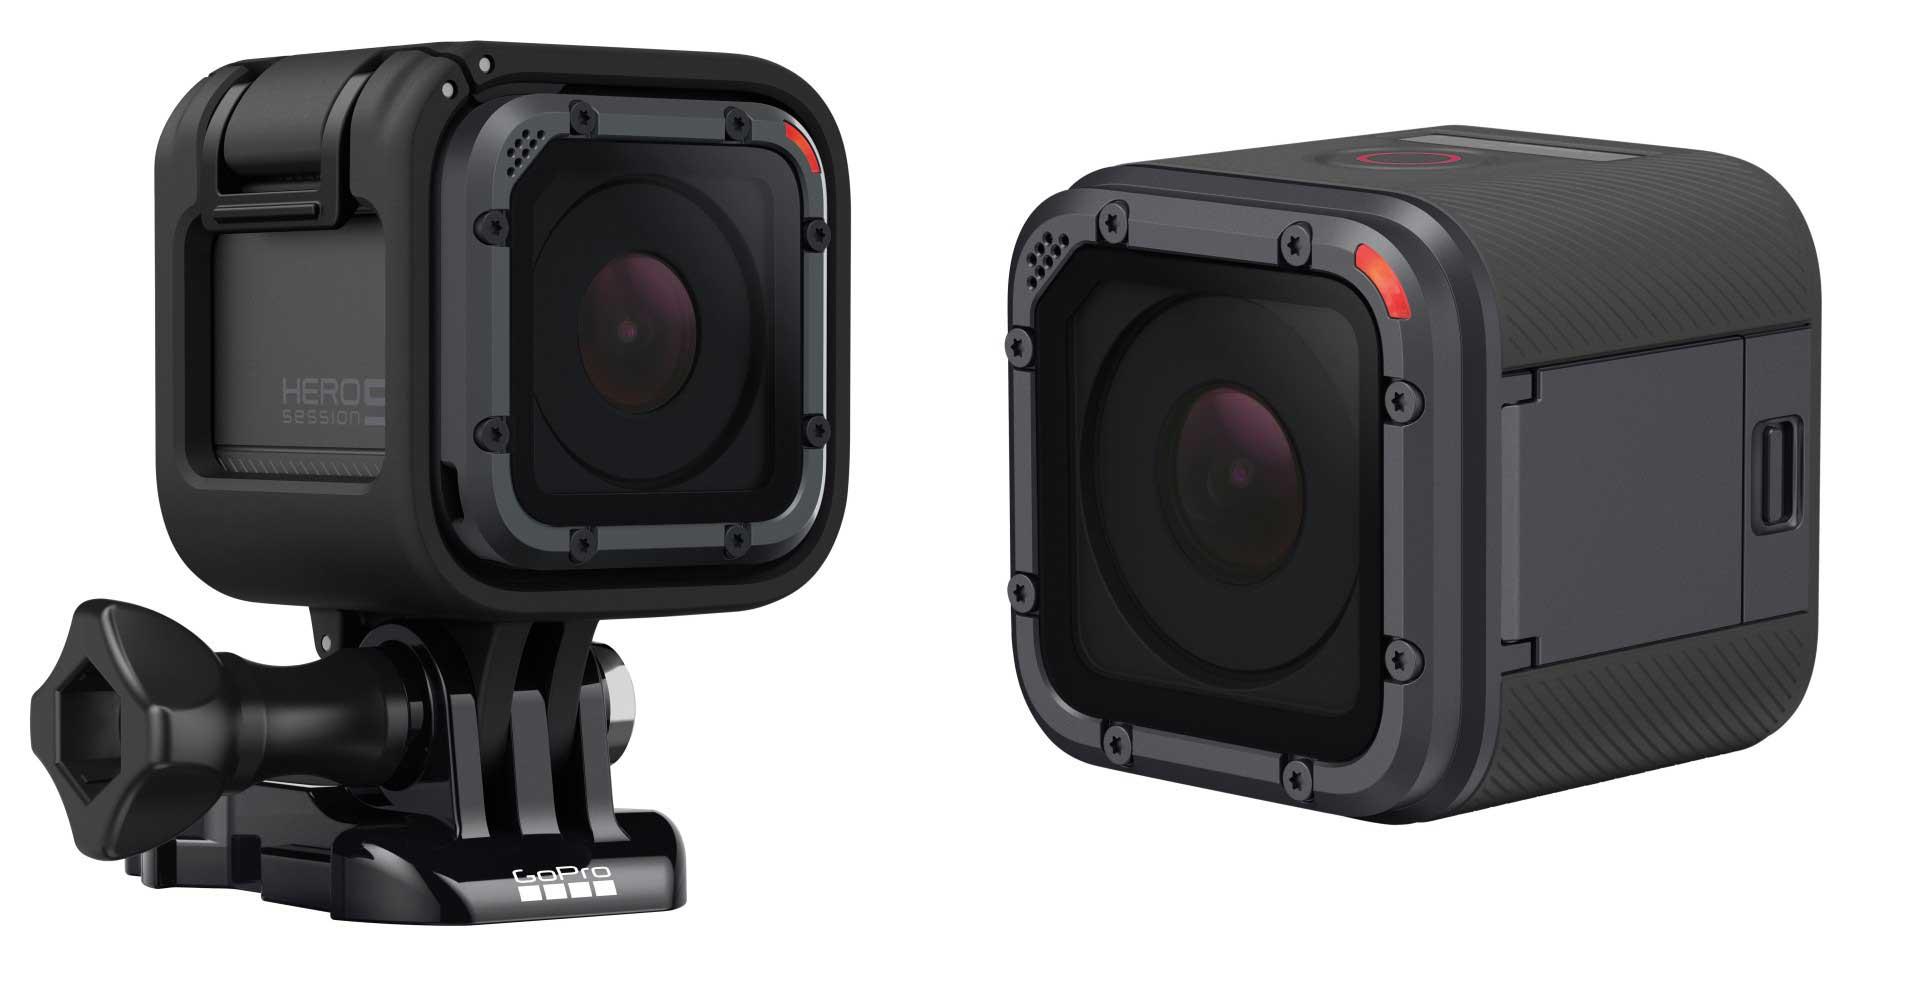 GoPro Hero 5 Session Action-Kamera für 263,96€ (Vaola)